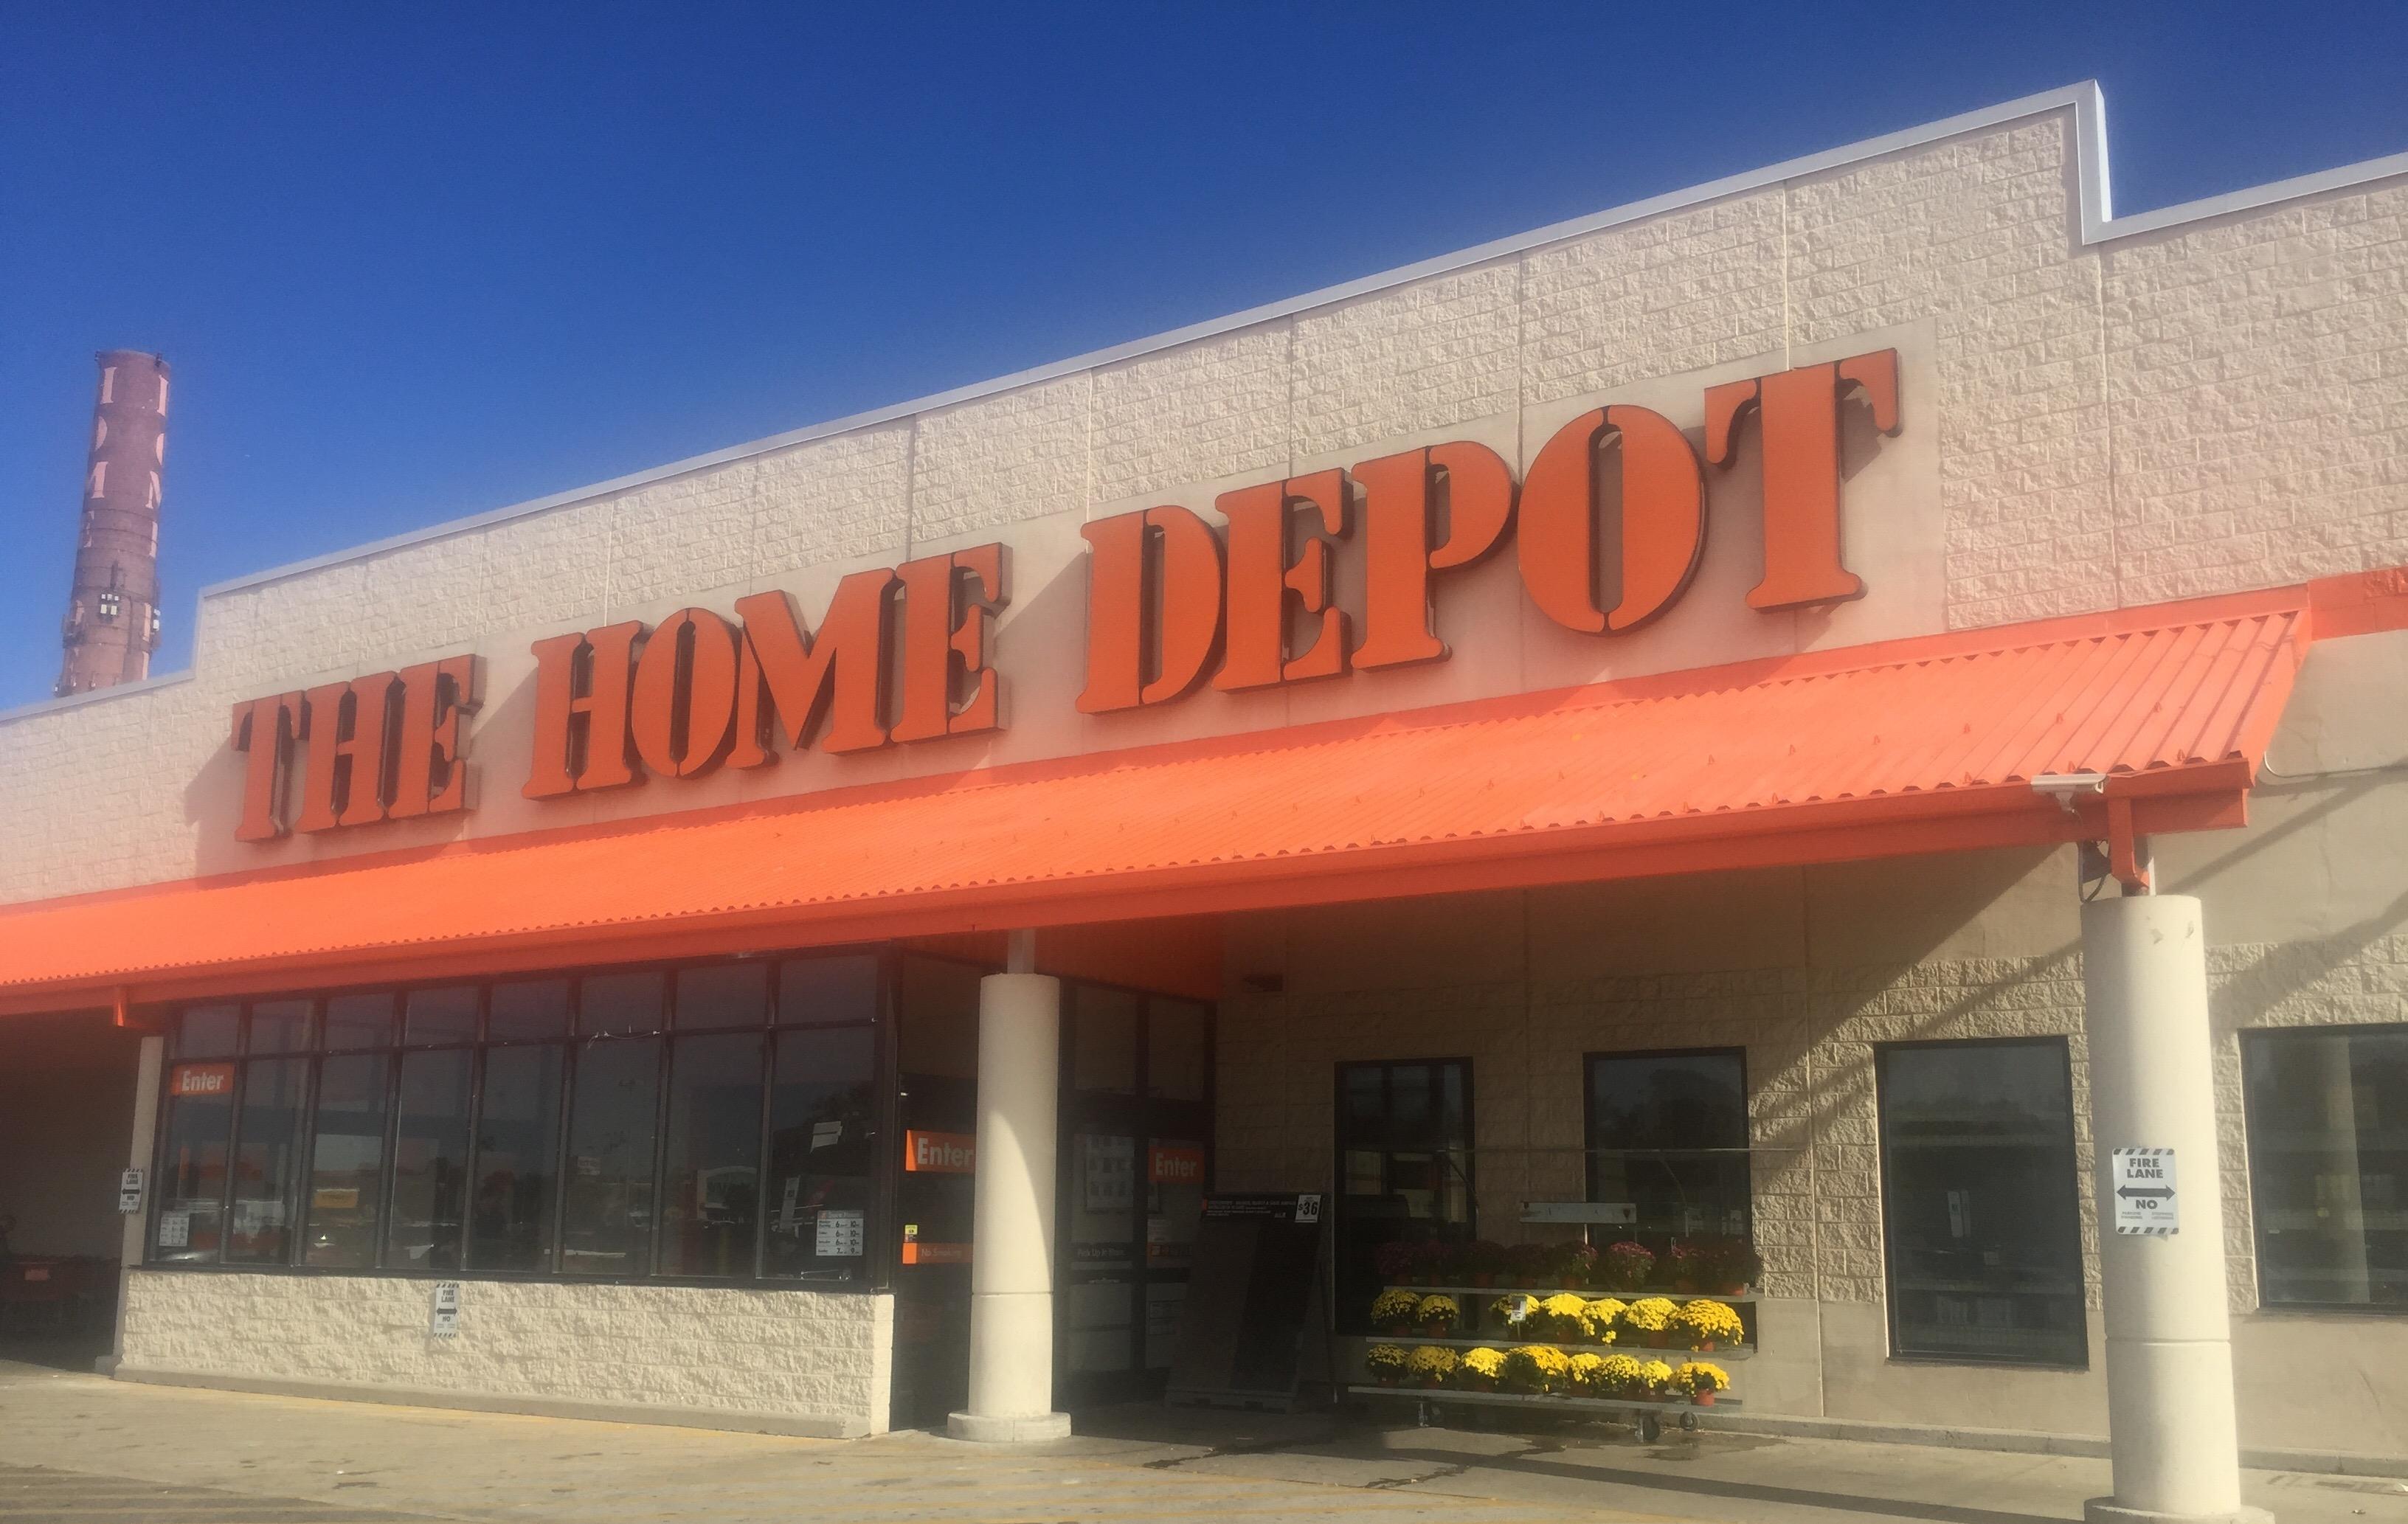 The Home Depot 4640 Roosevelt Blvd Philadelphia, PA Hardware